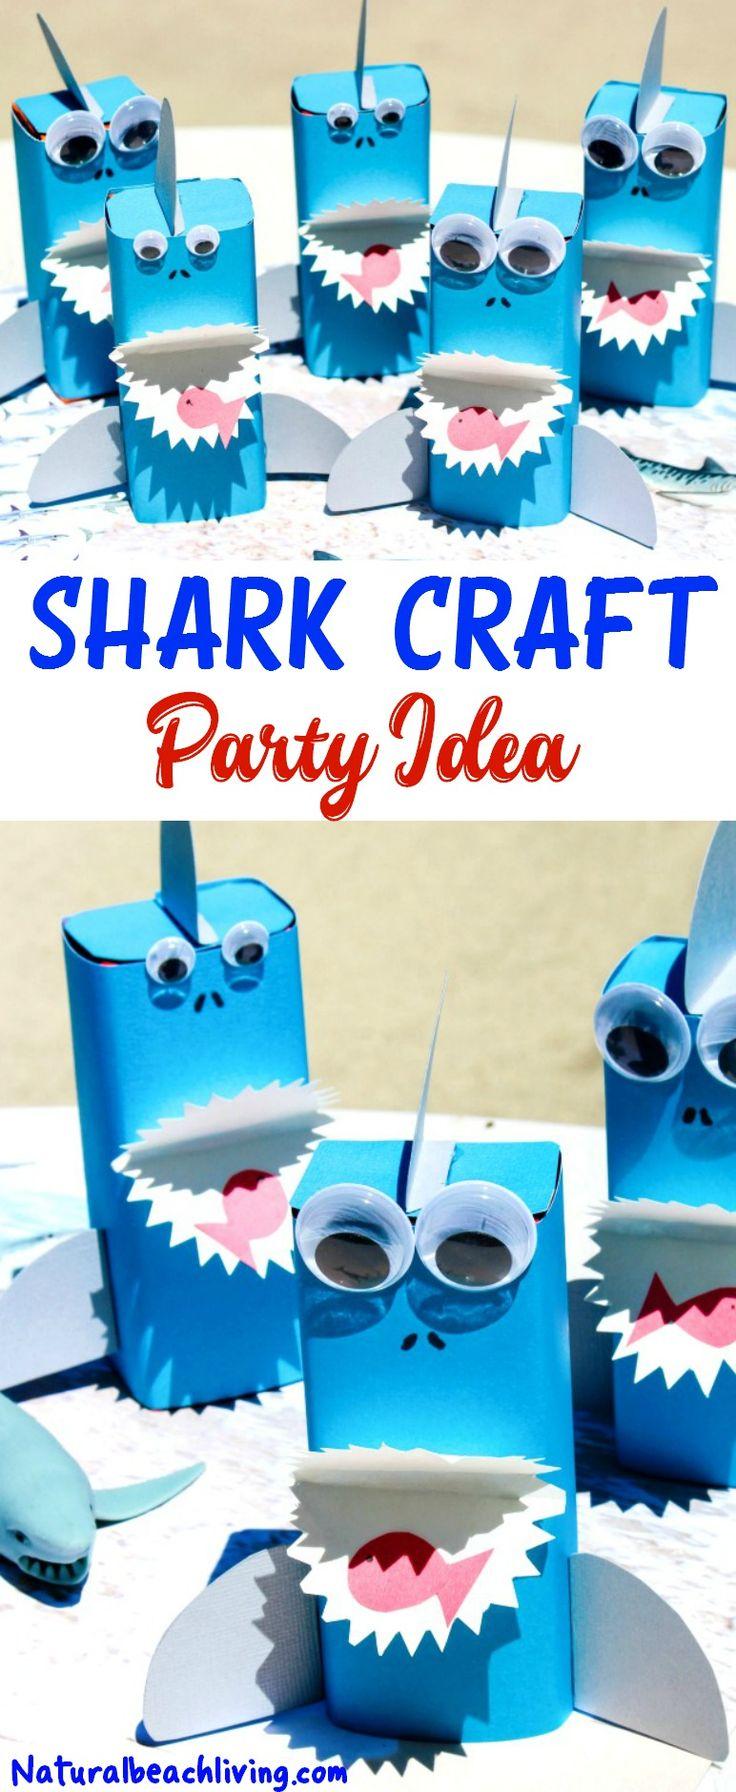 Shark Craft Perfect Under the Sea Party Idea, Shark Crafts for Kids, Shark Week Ideas for Kids, Ocean Theme Party Food Idea, Fun for a Kids Summer Idea